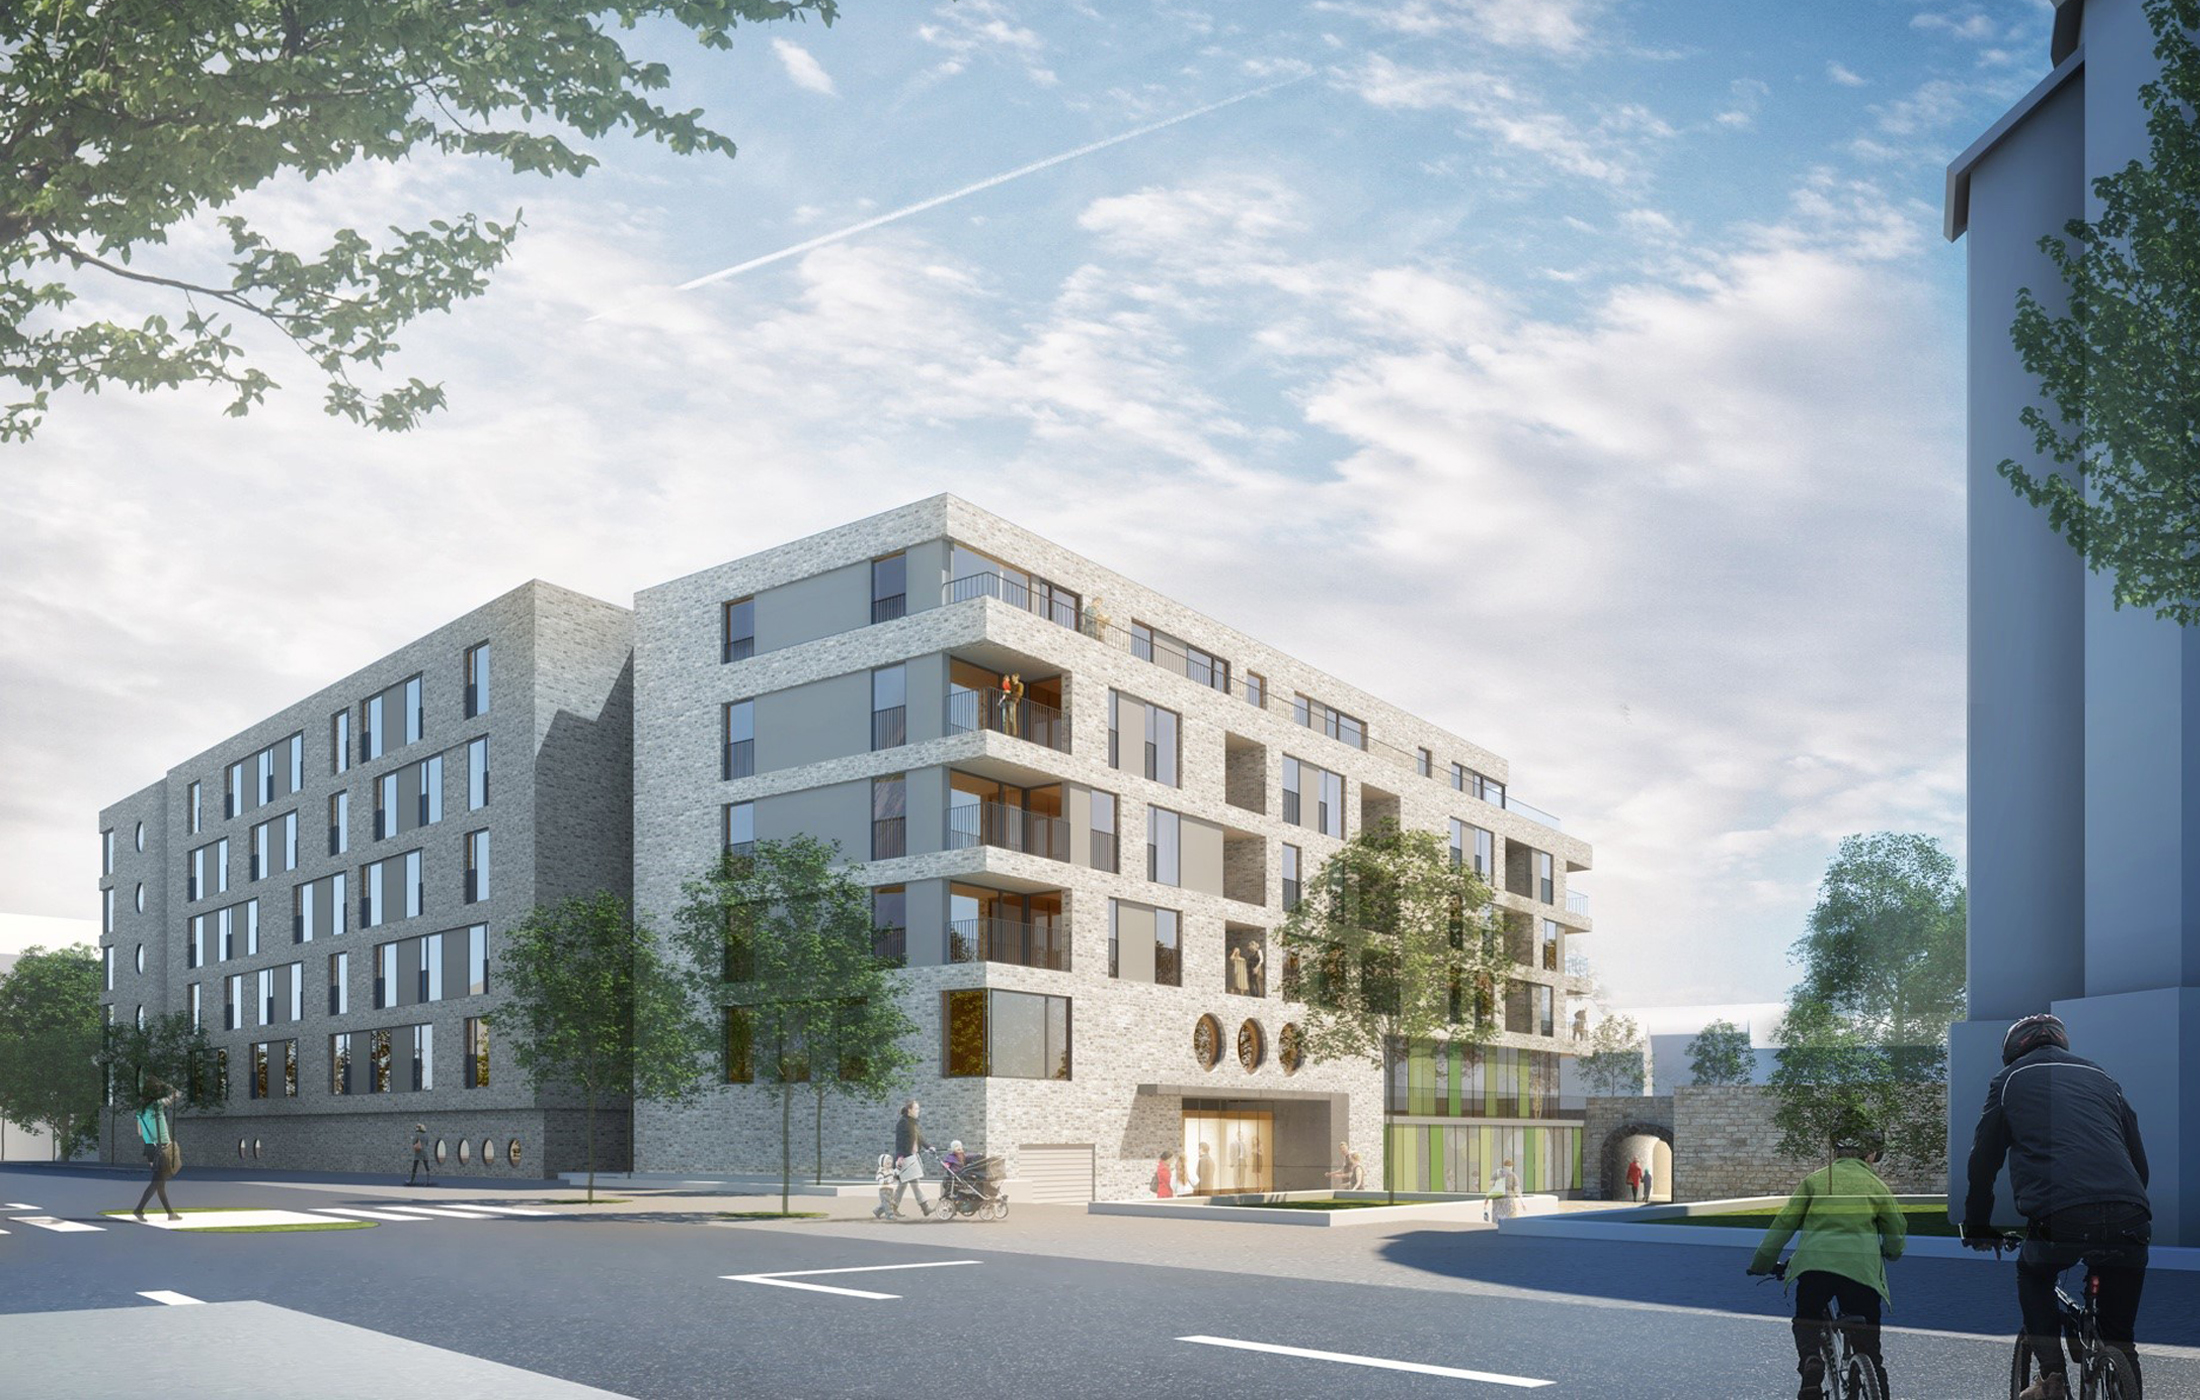 2022, Neubau Dreifaltigkeitshof, Ulm